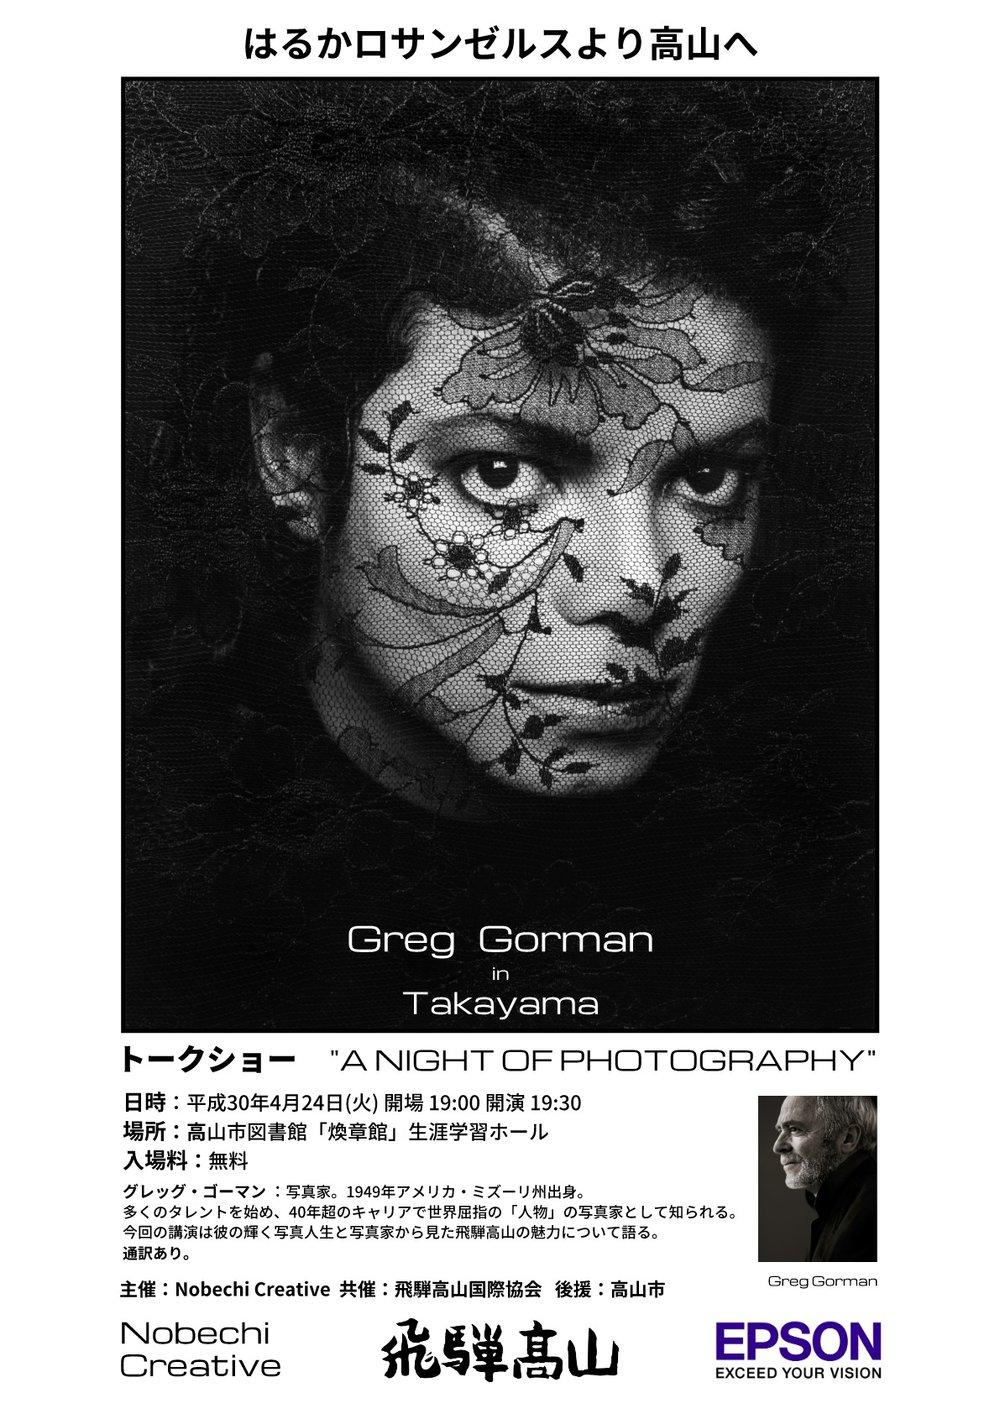 GG-Takayama-Flyer2 (1).jpeg